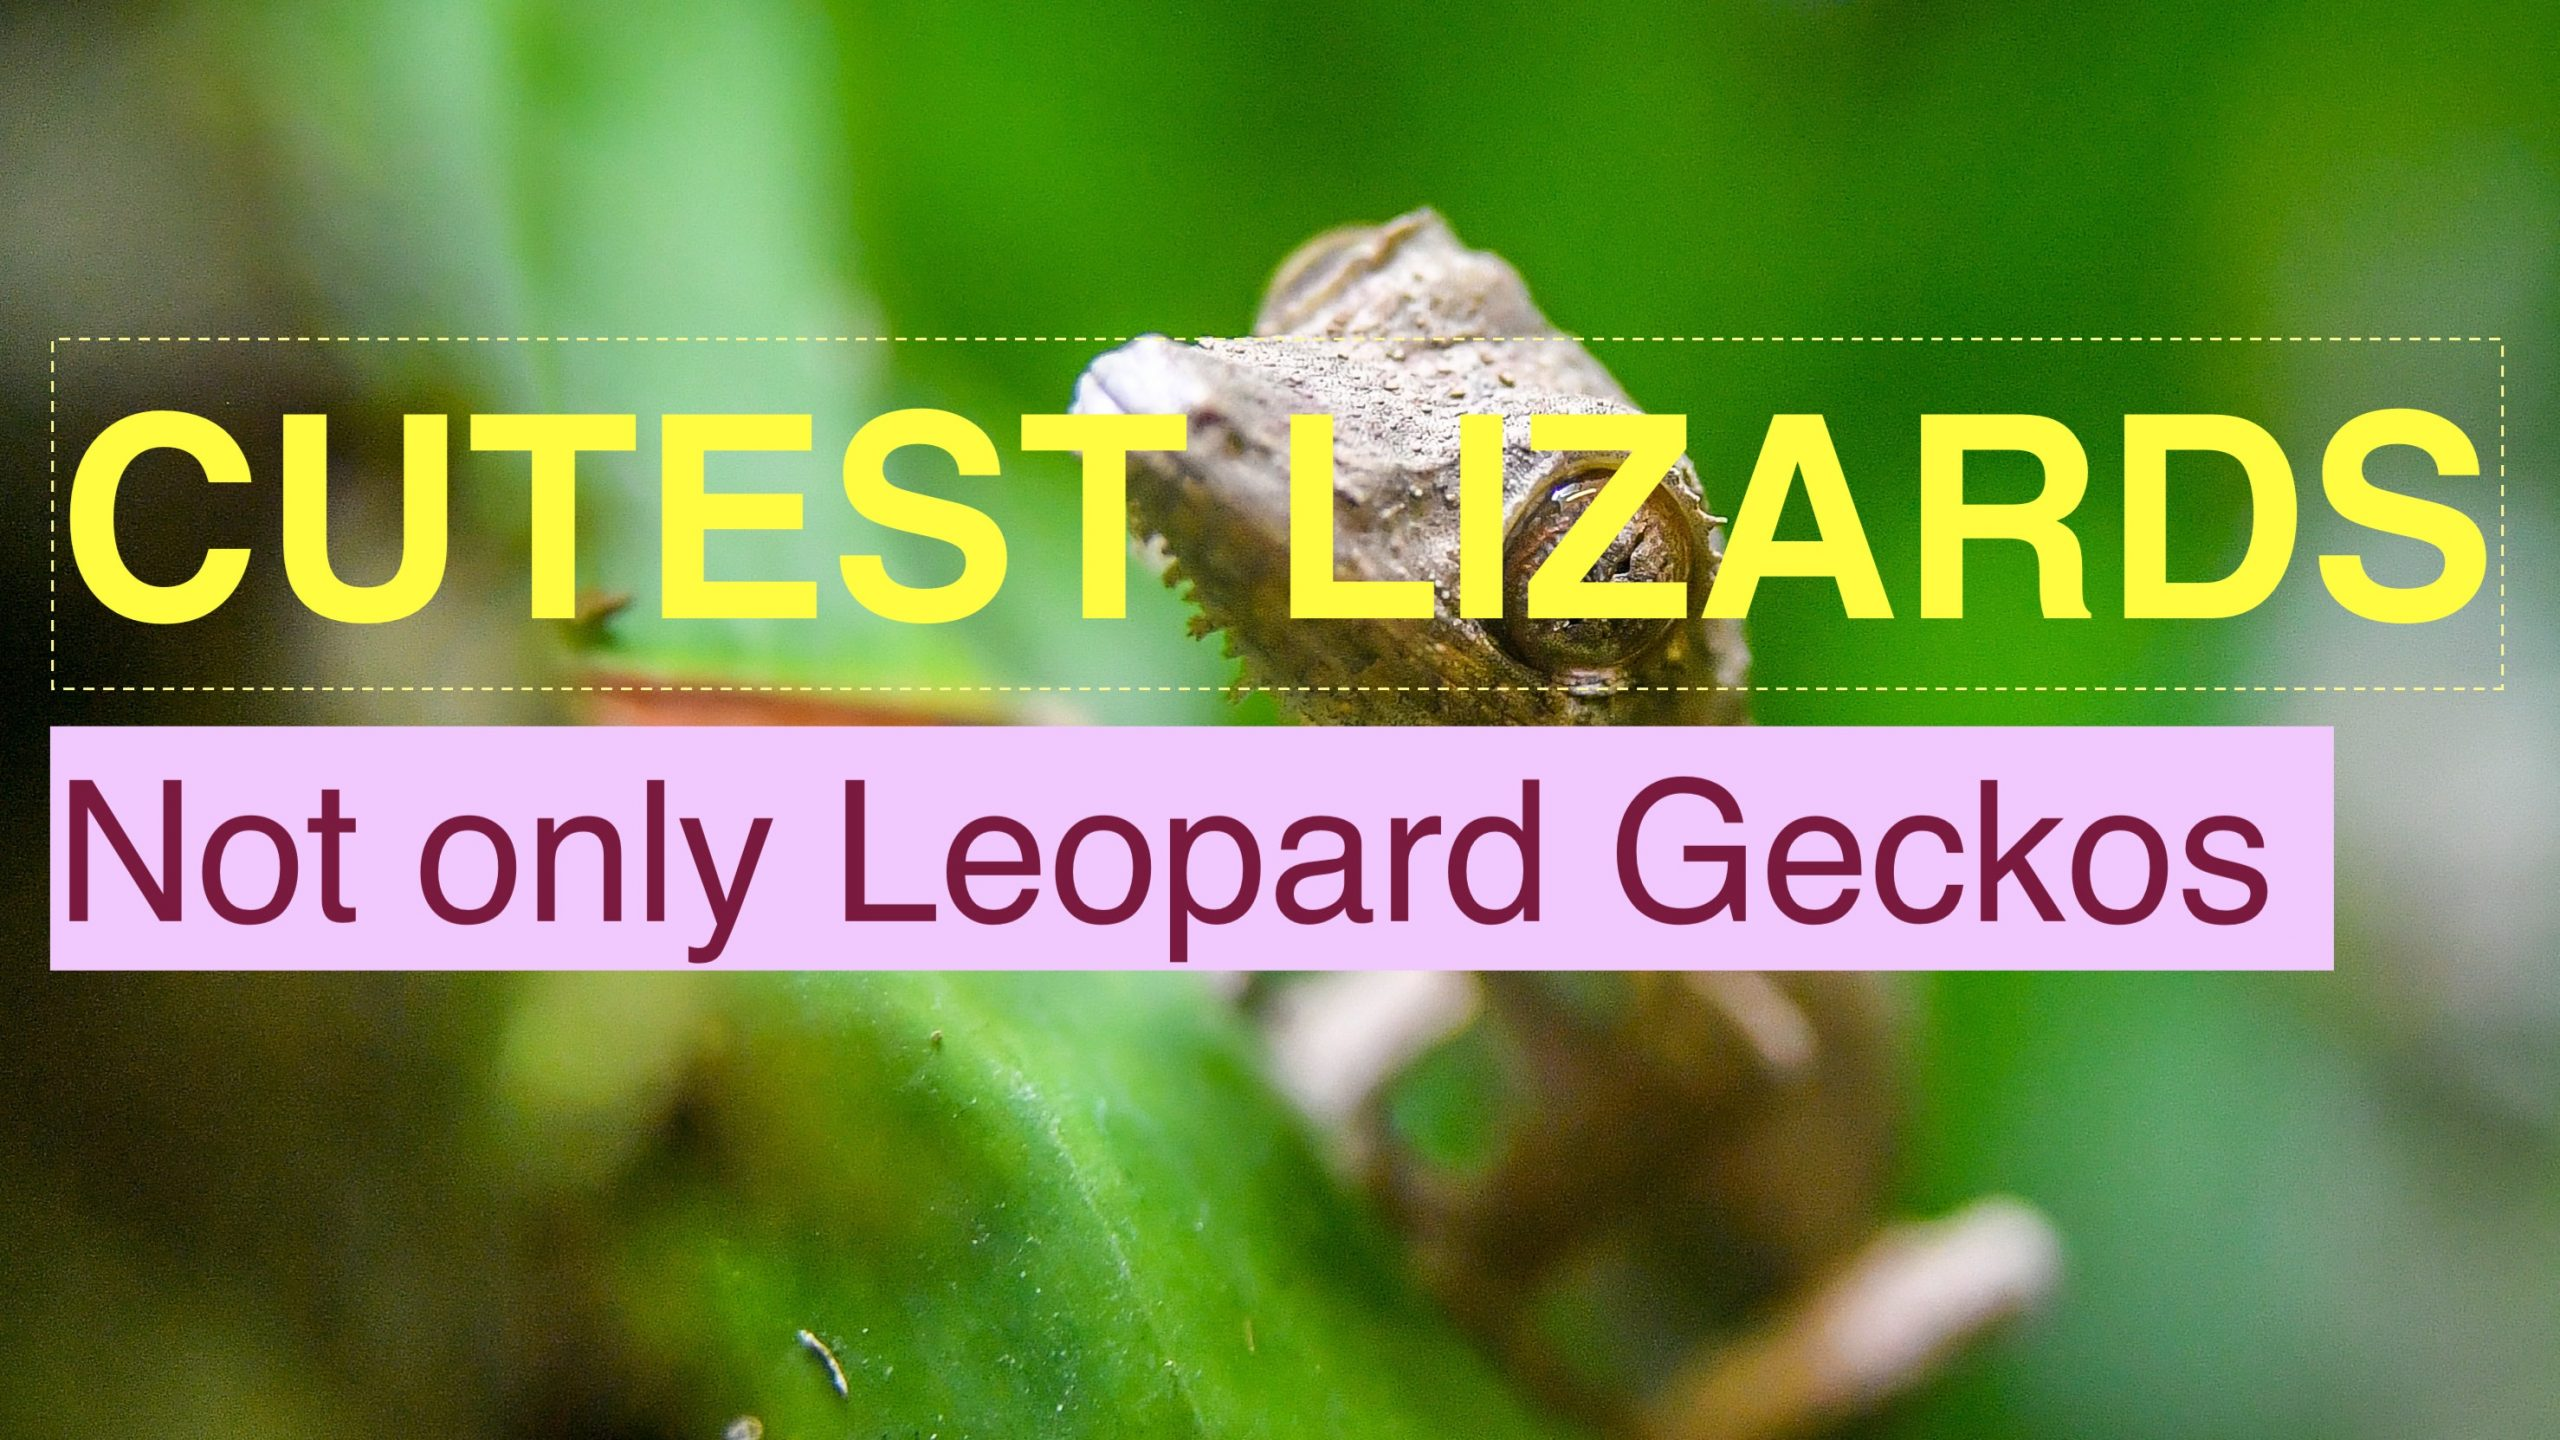 Photo of Cute pet lizards(Top 7 cutest lizard species)